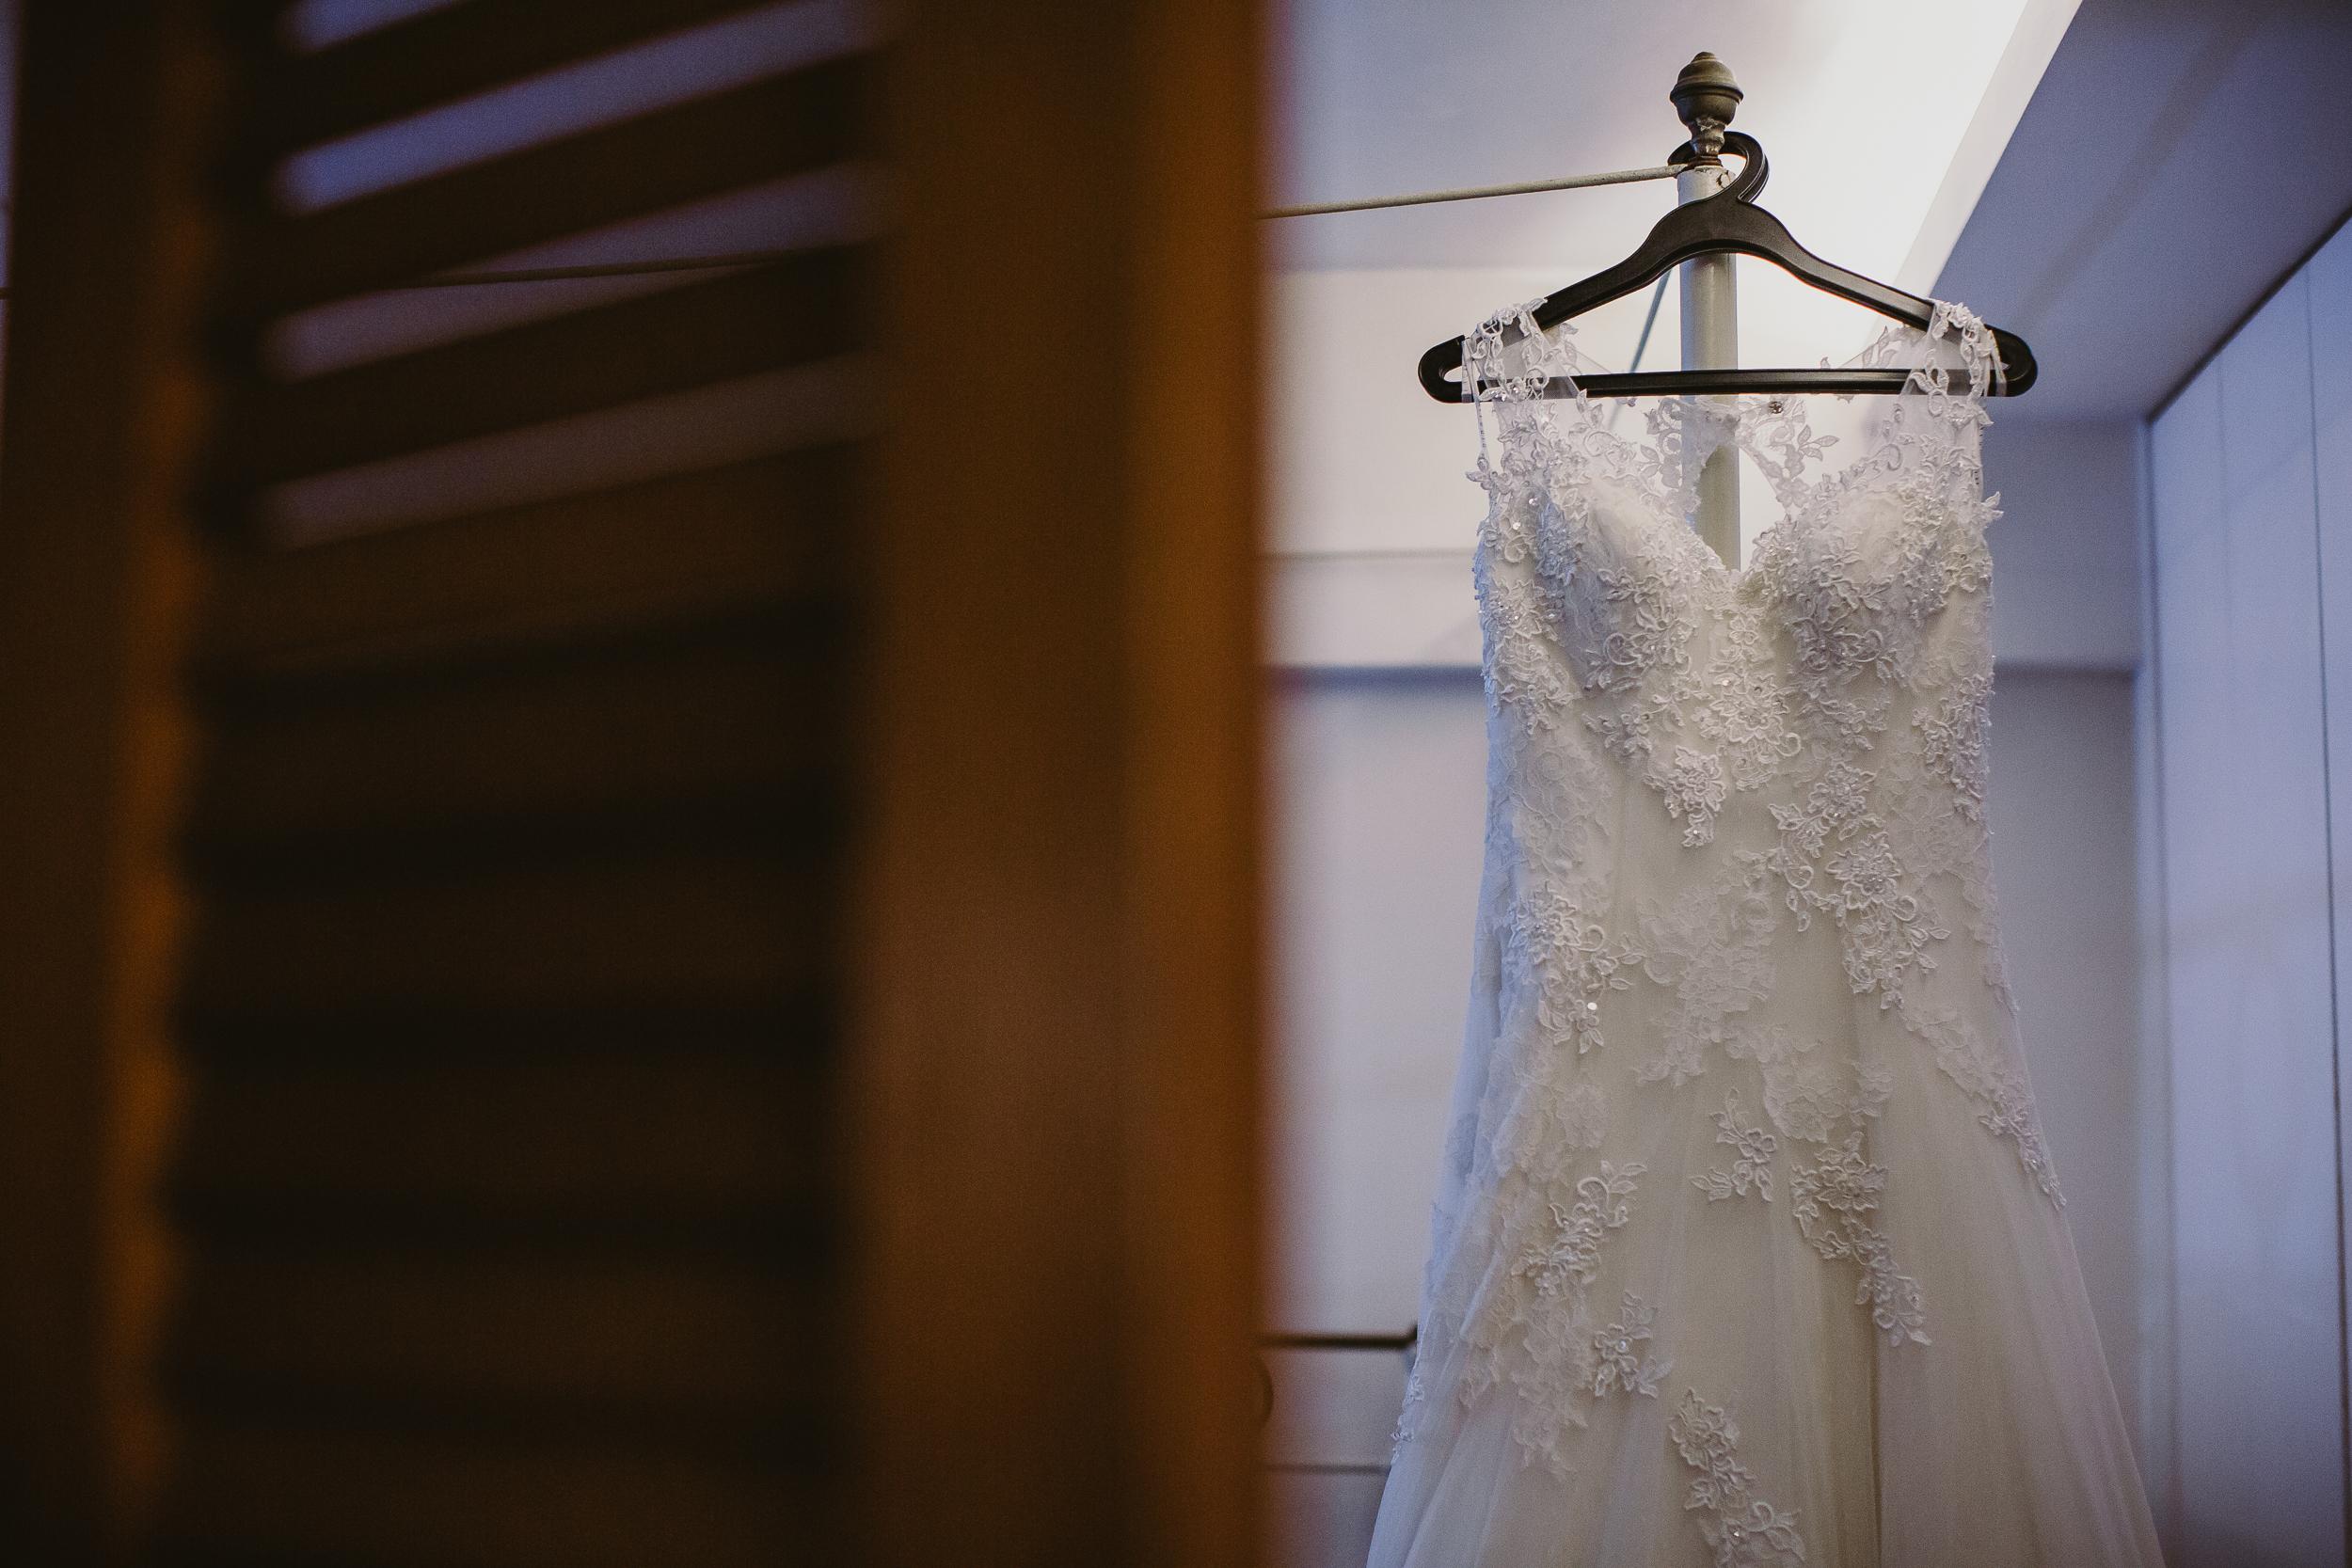 Singapore+Actual+Day+Wedding+Photographer+Min+Jiang+Rochester+Gareth+Faith--0001.jpg